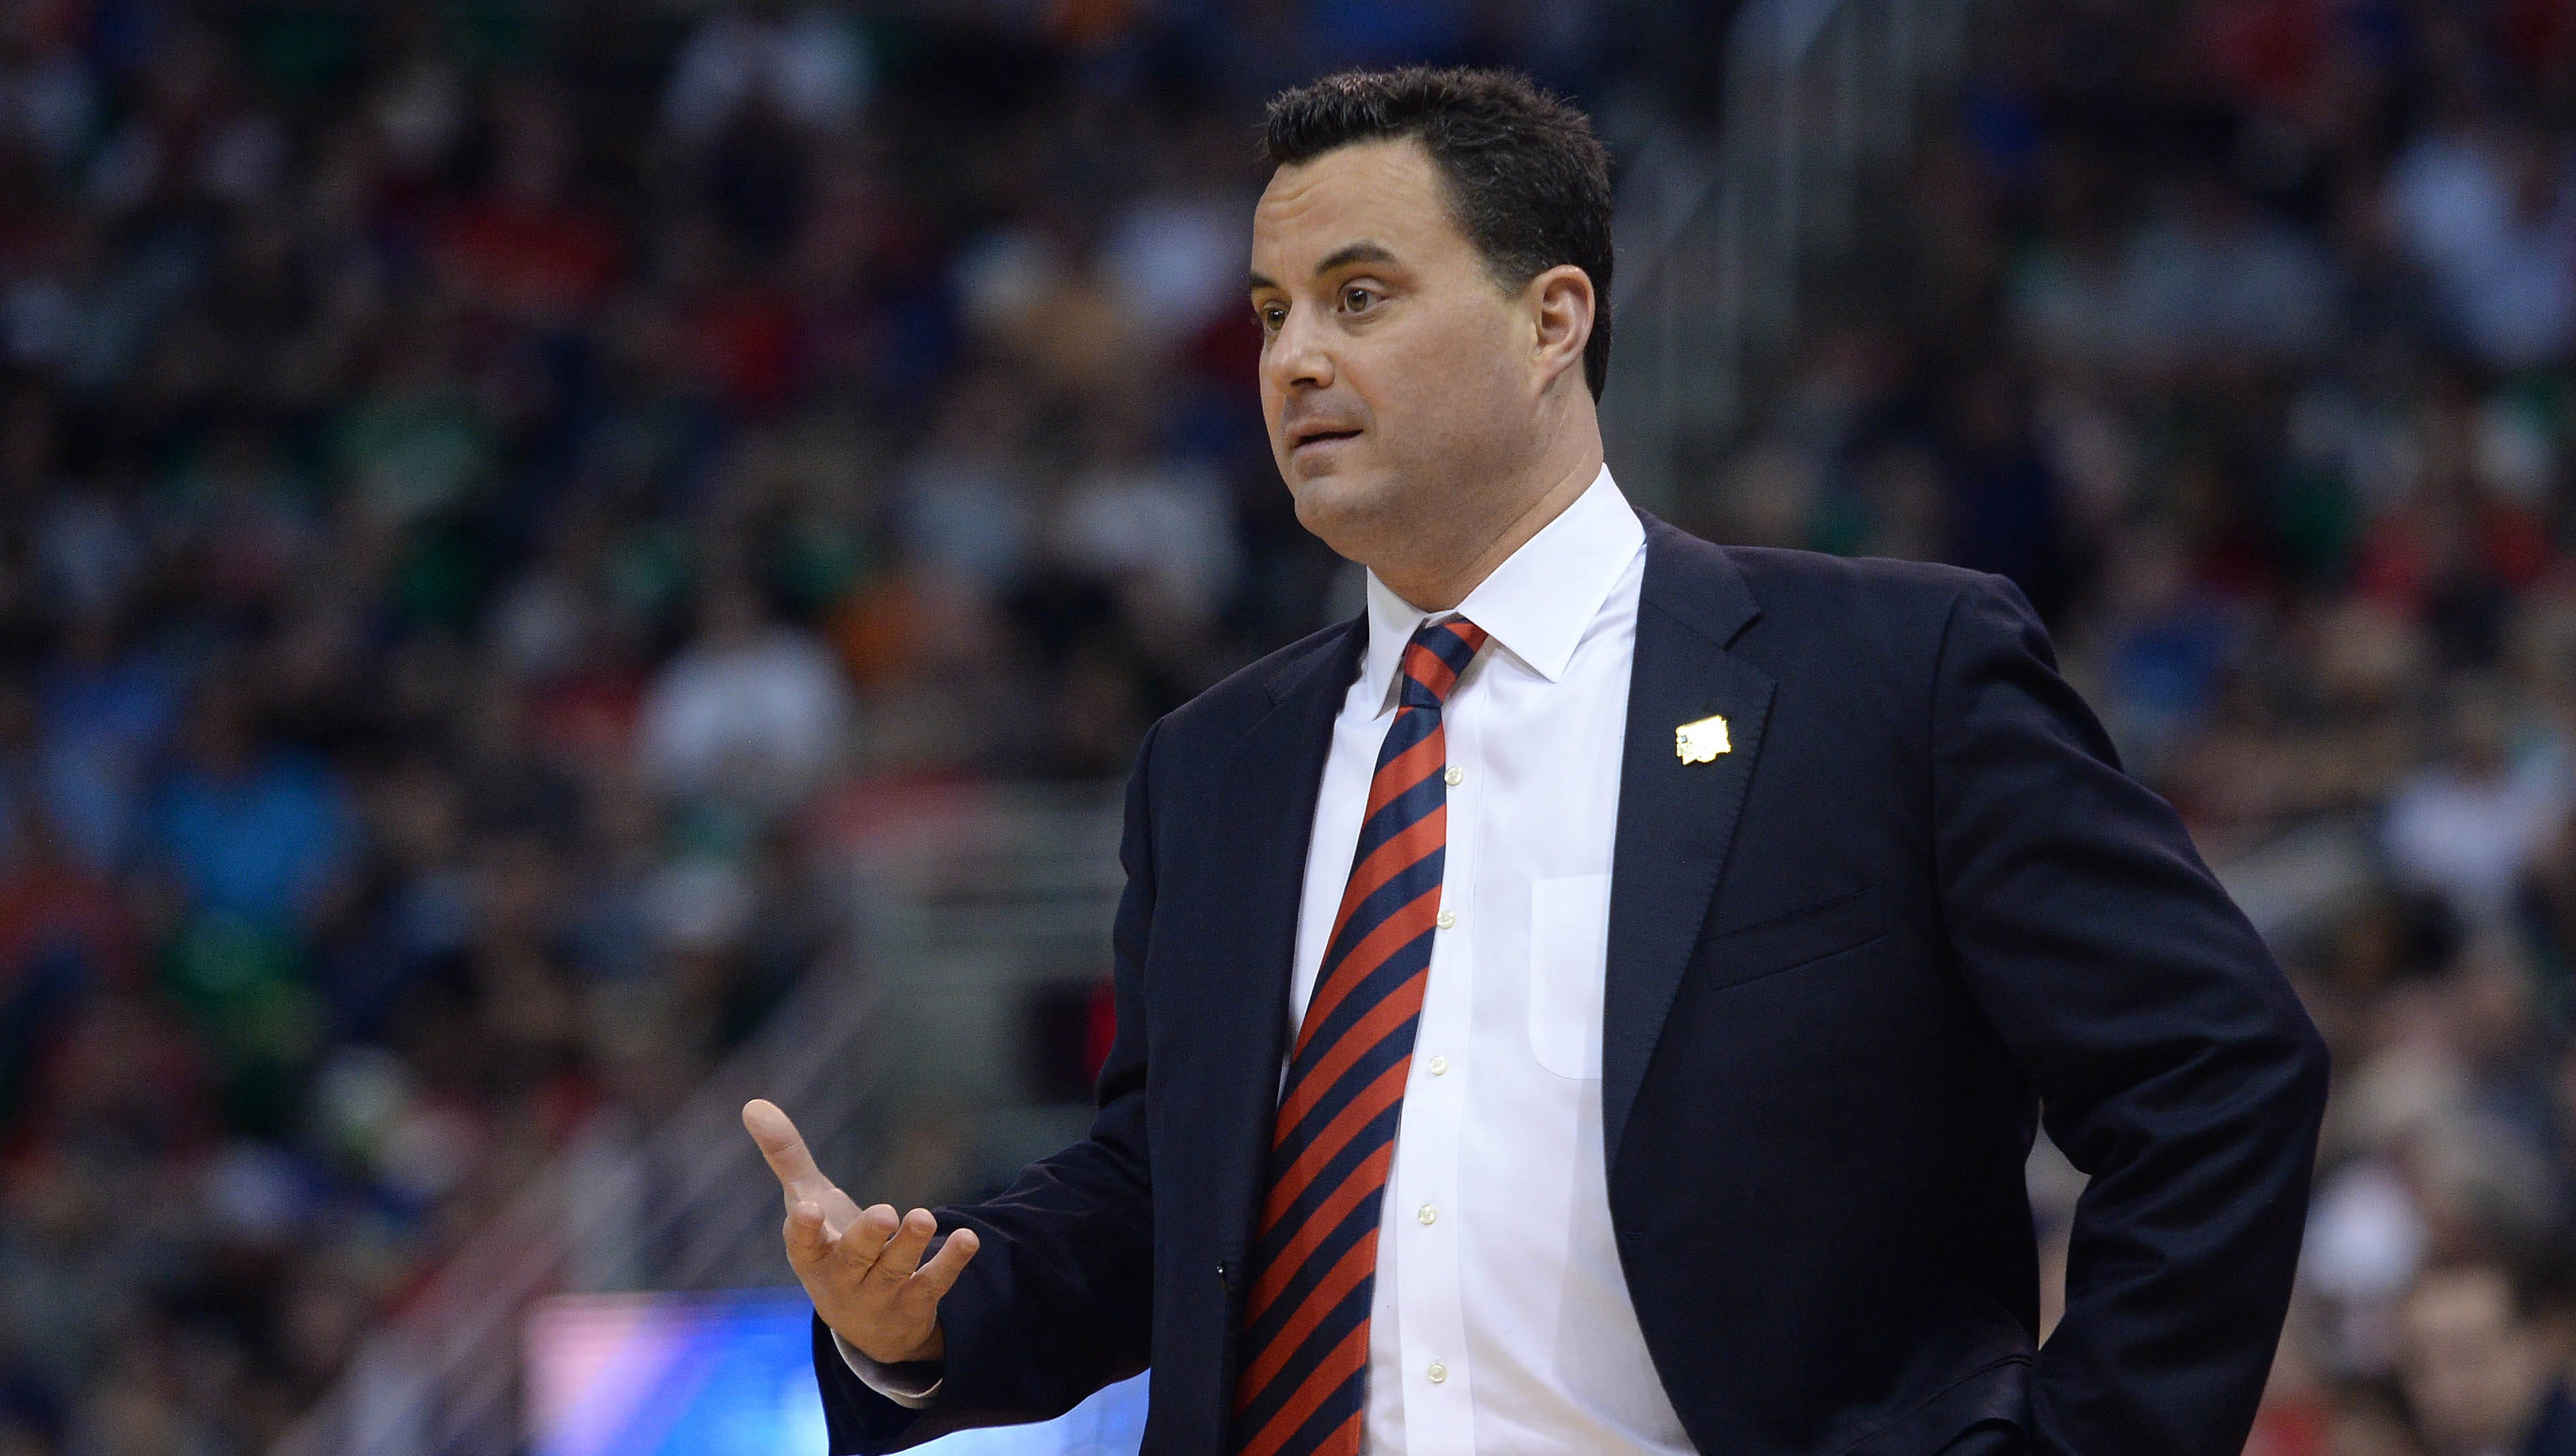 Once Again Arizona Wildcats Sean Miller Crosses Paths With Xavier Chris Mack